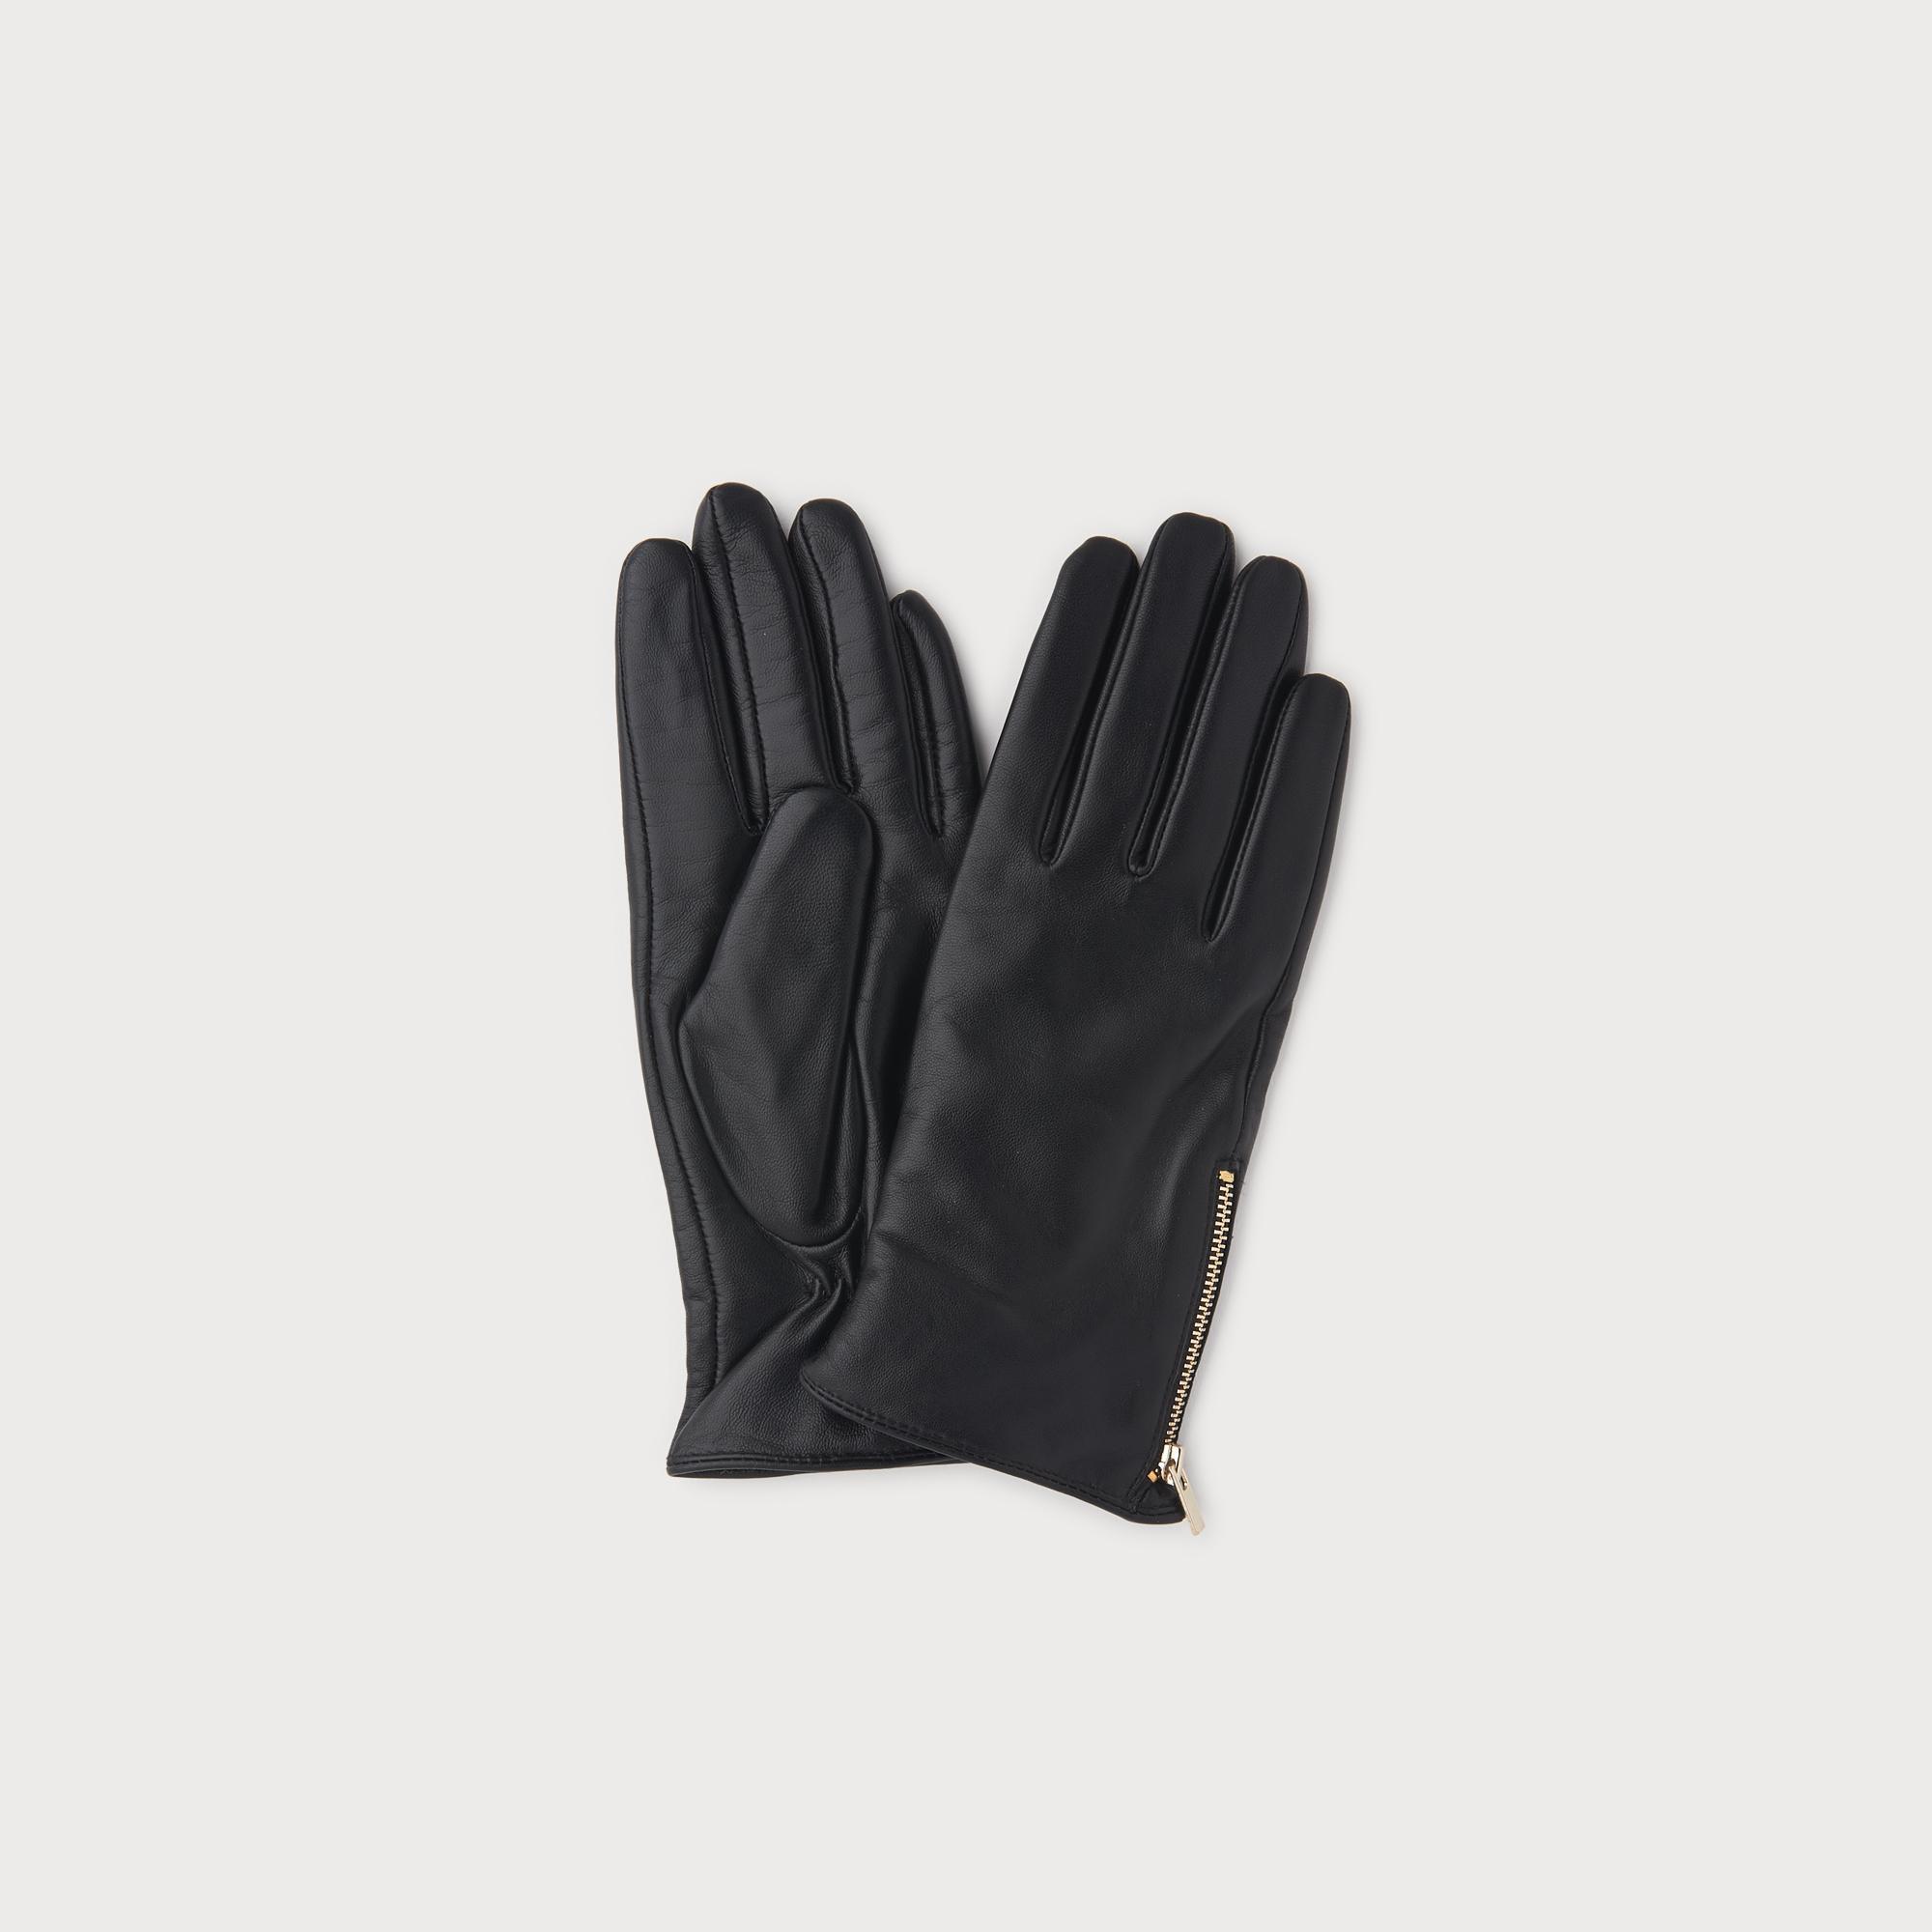 Kiera Black Leather Gloves by L.K.Bennett